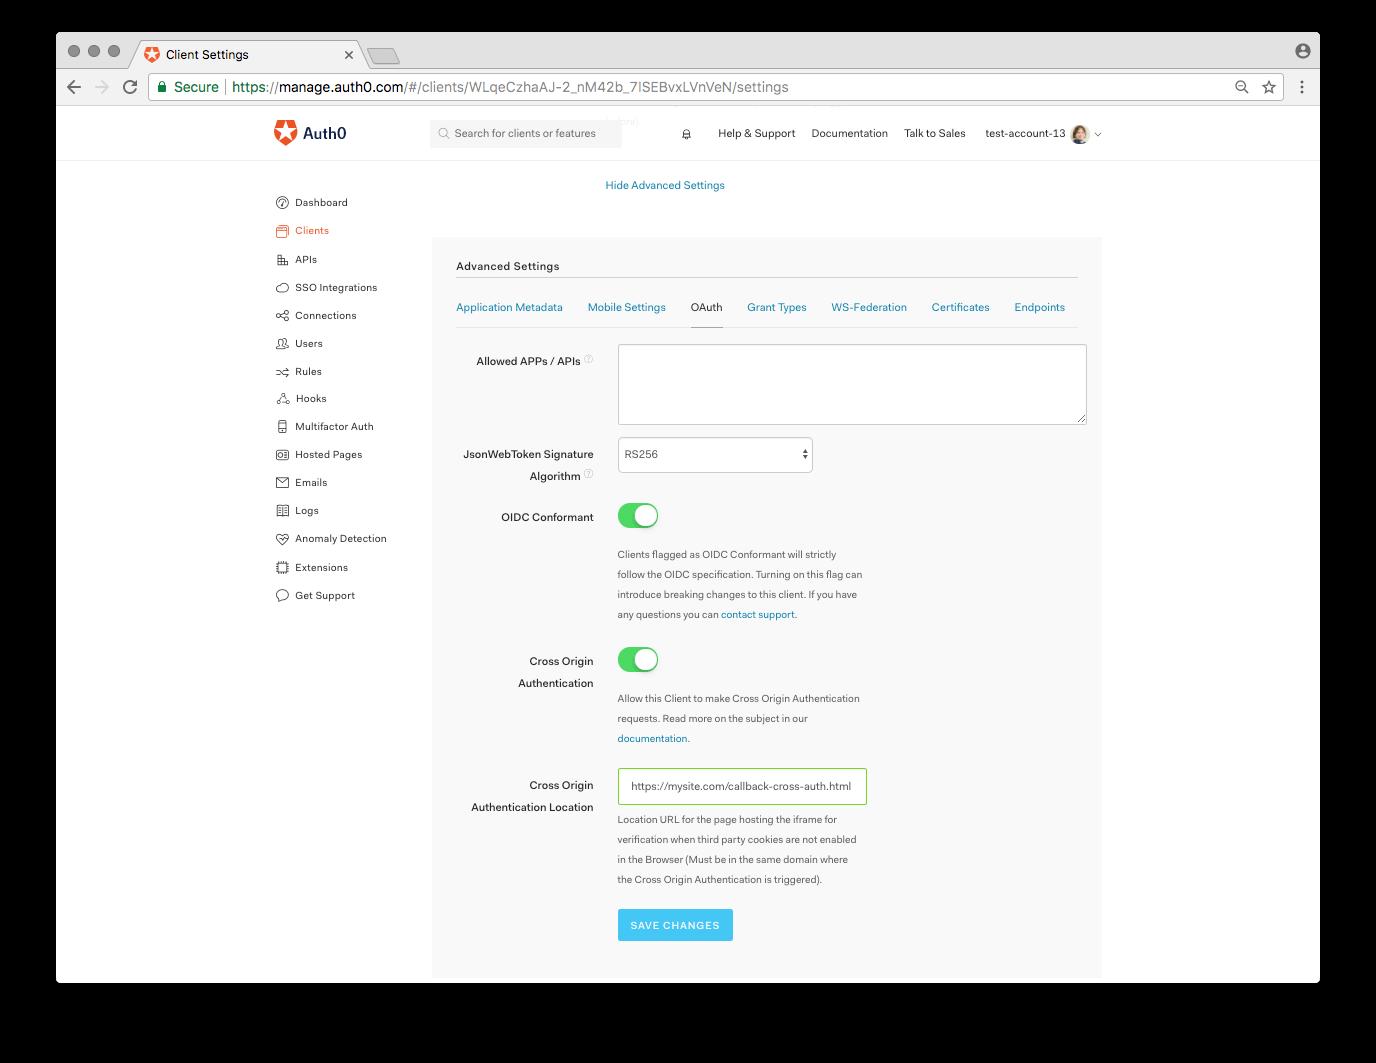 Cross-Origin Authentication switch